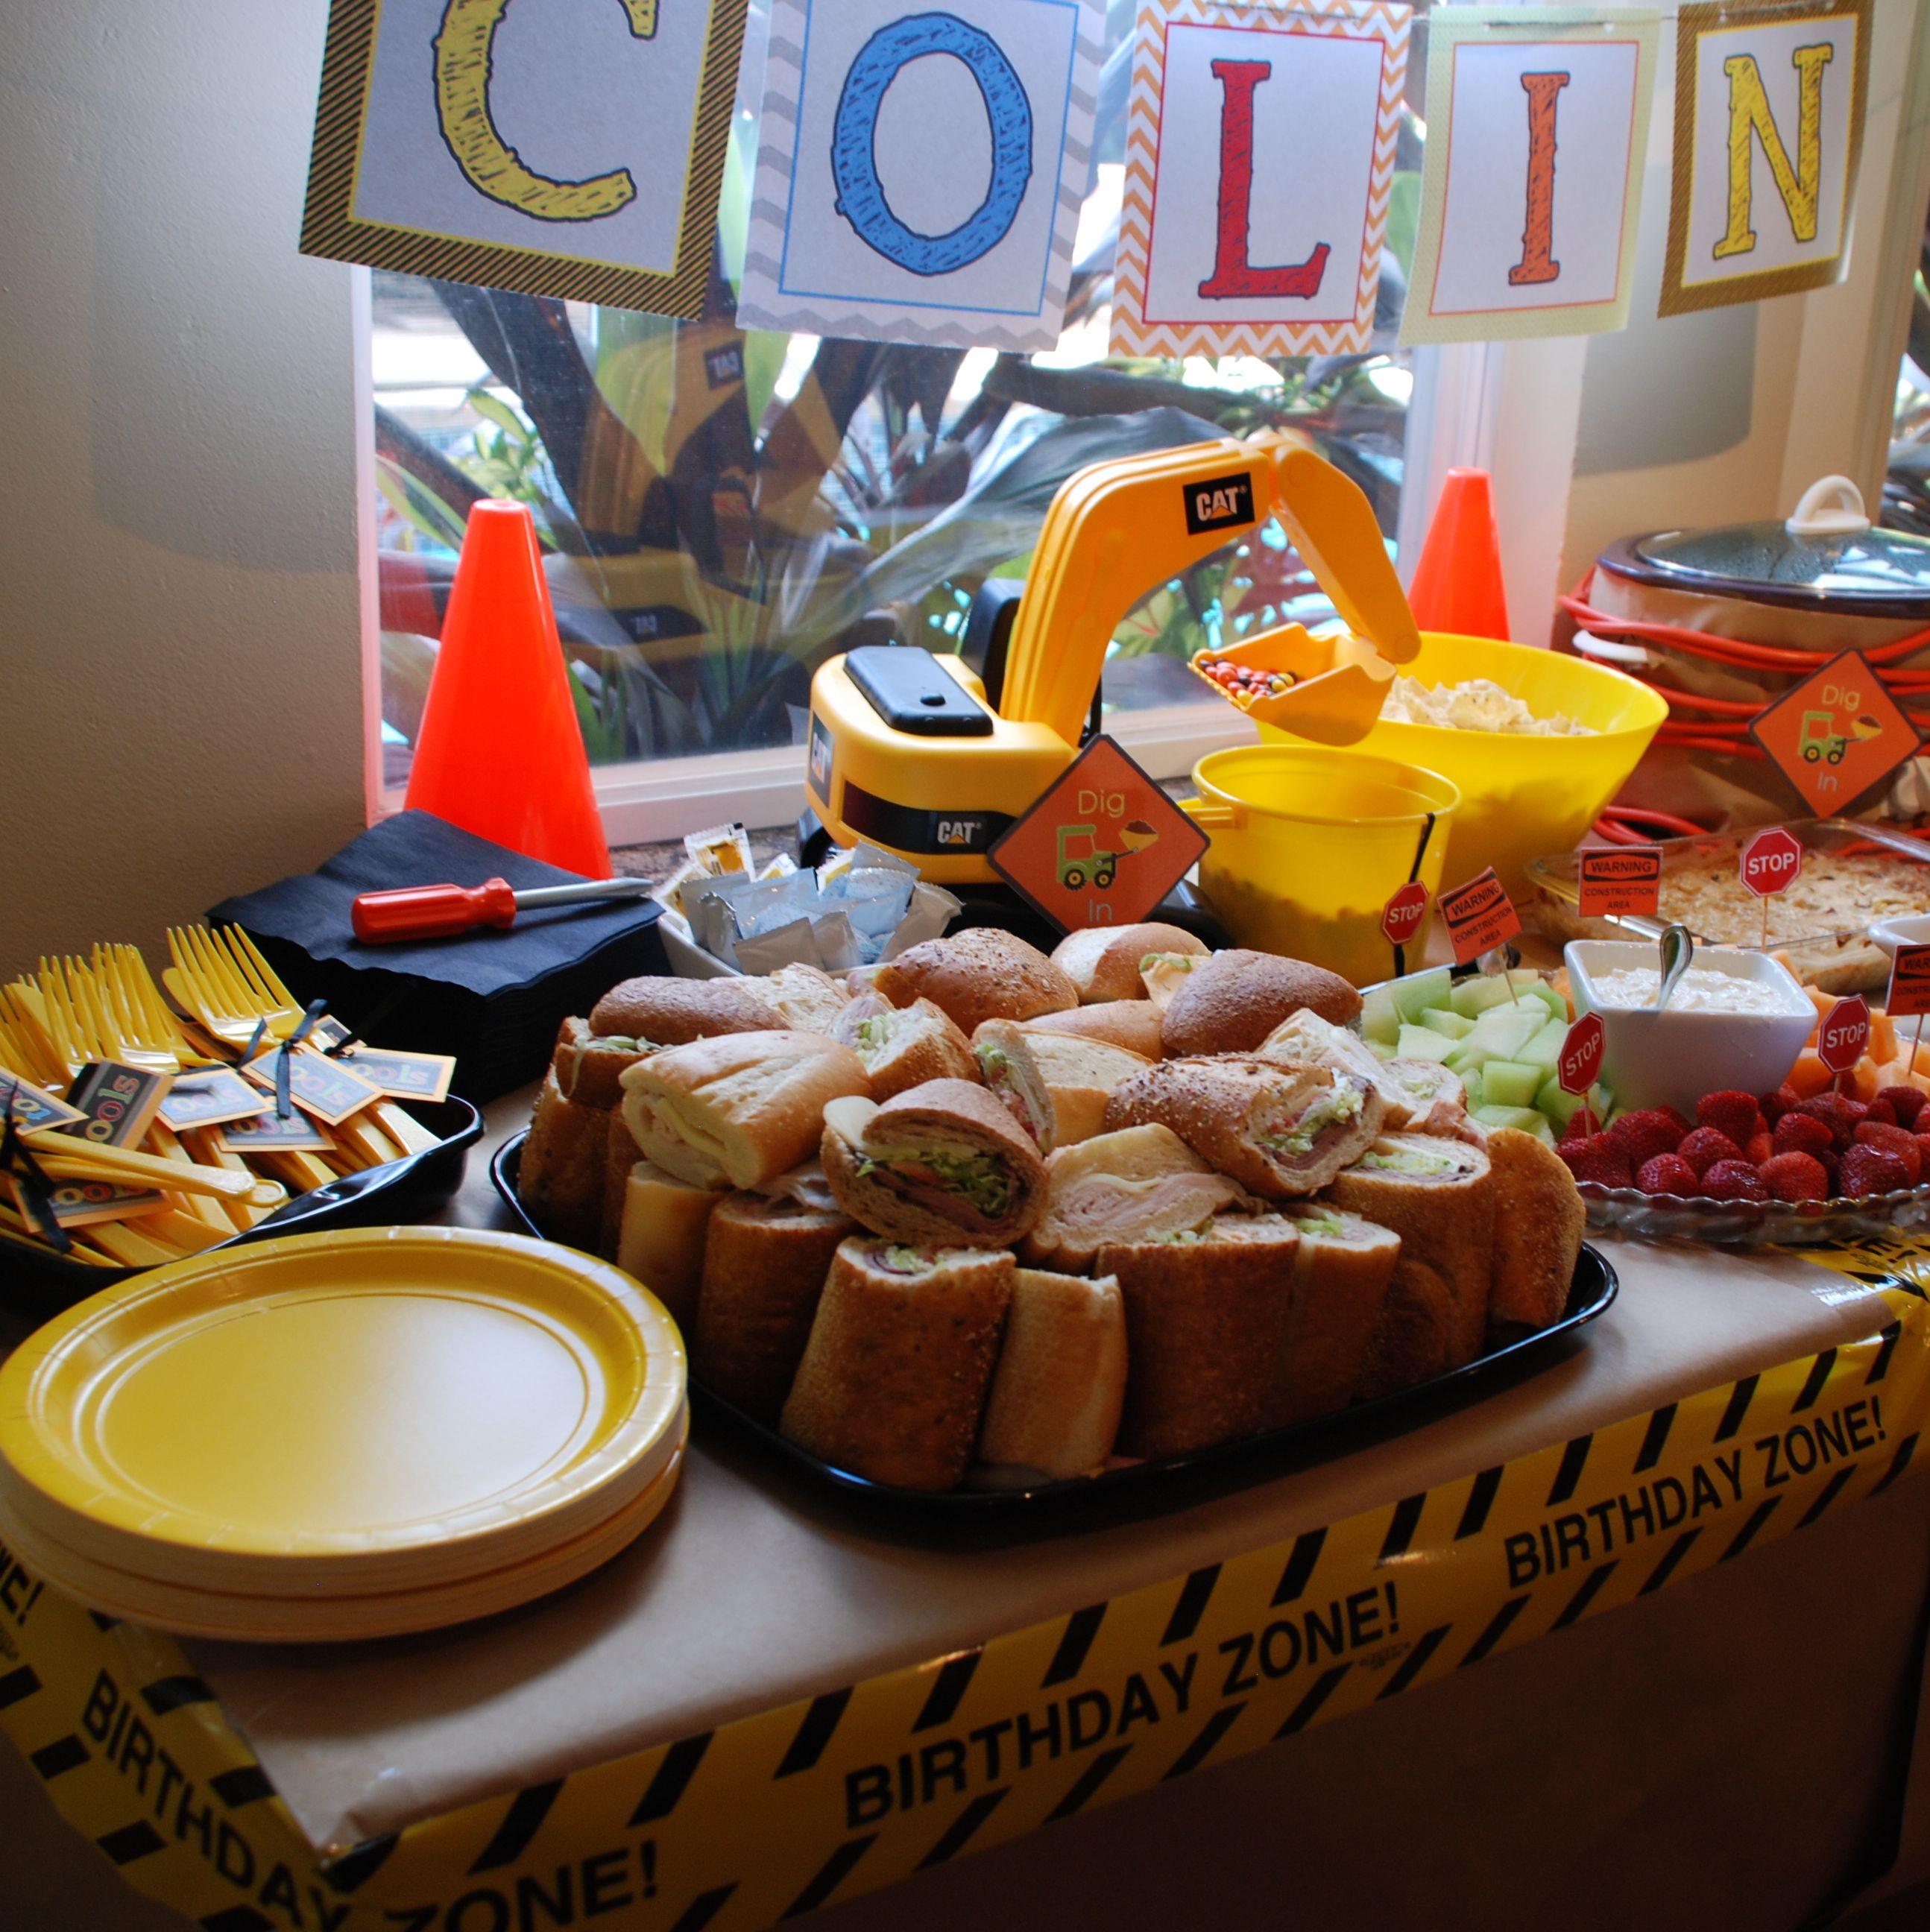 Construction birthday party food ideas construction